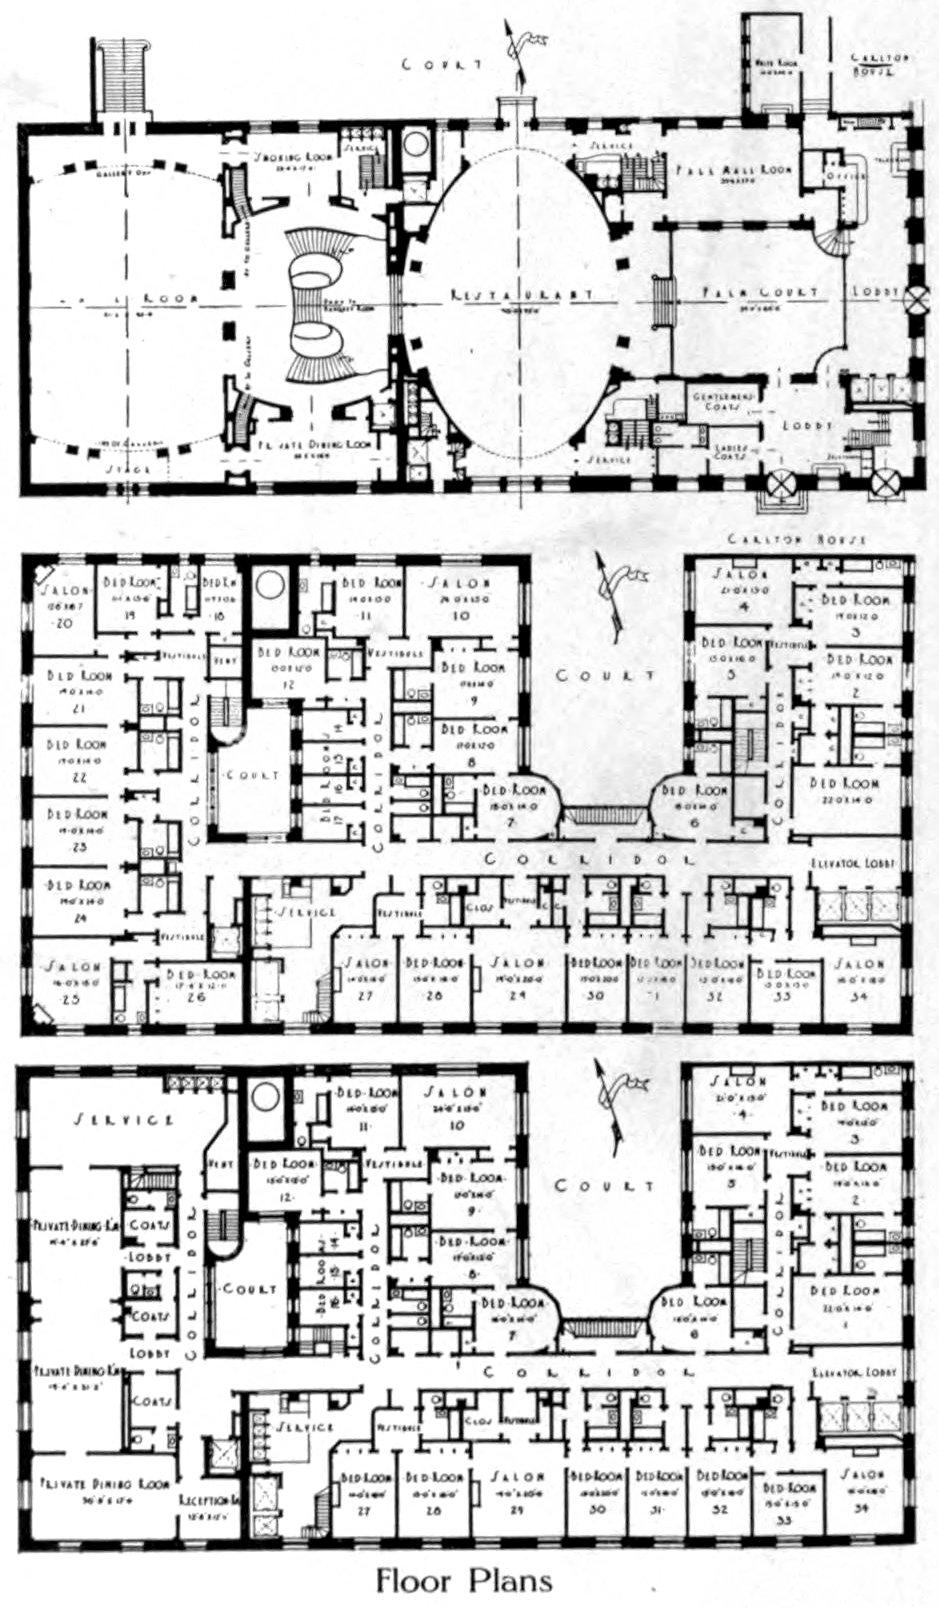 Old Ritz-Carlton Hotel floor plans (1913) - ClickAmericana com